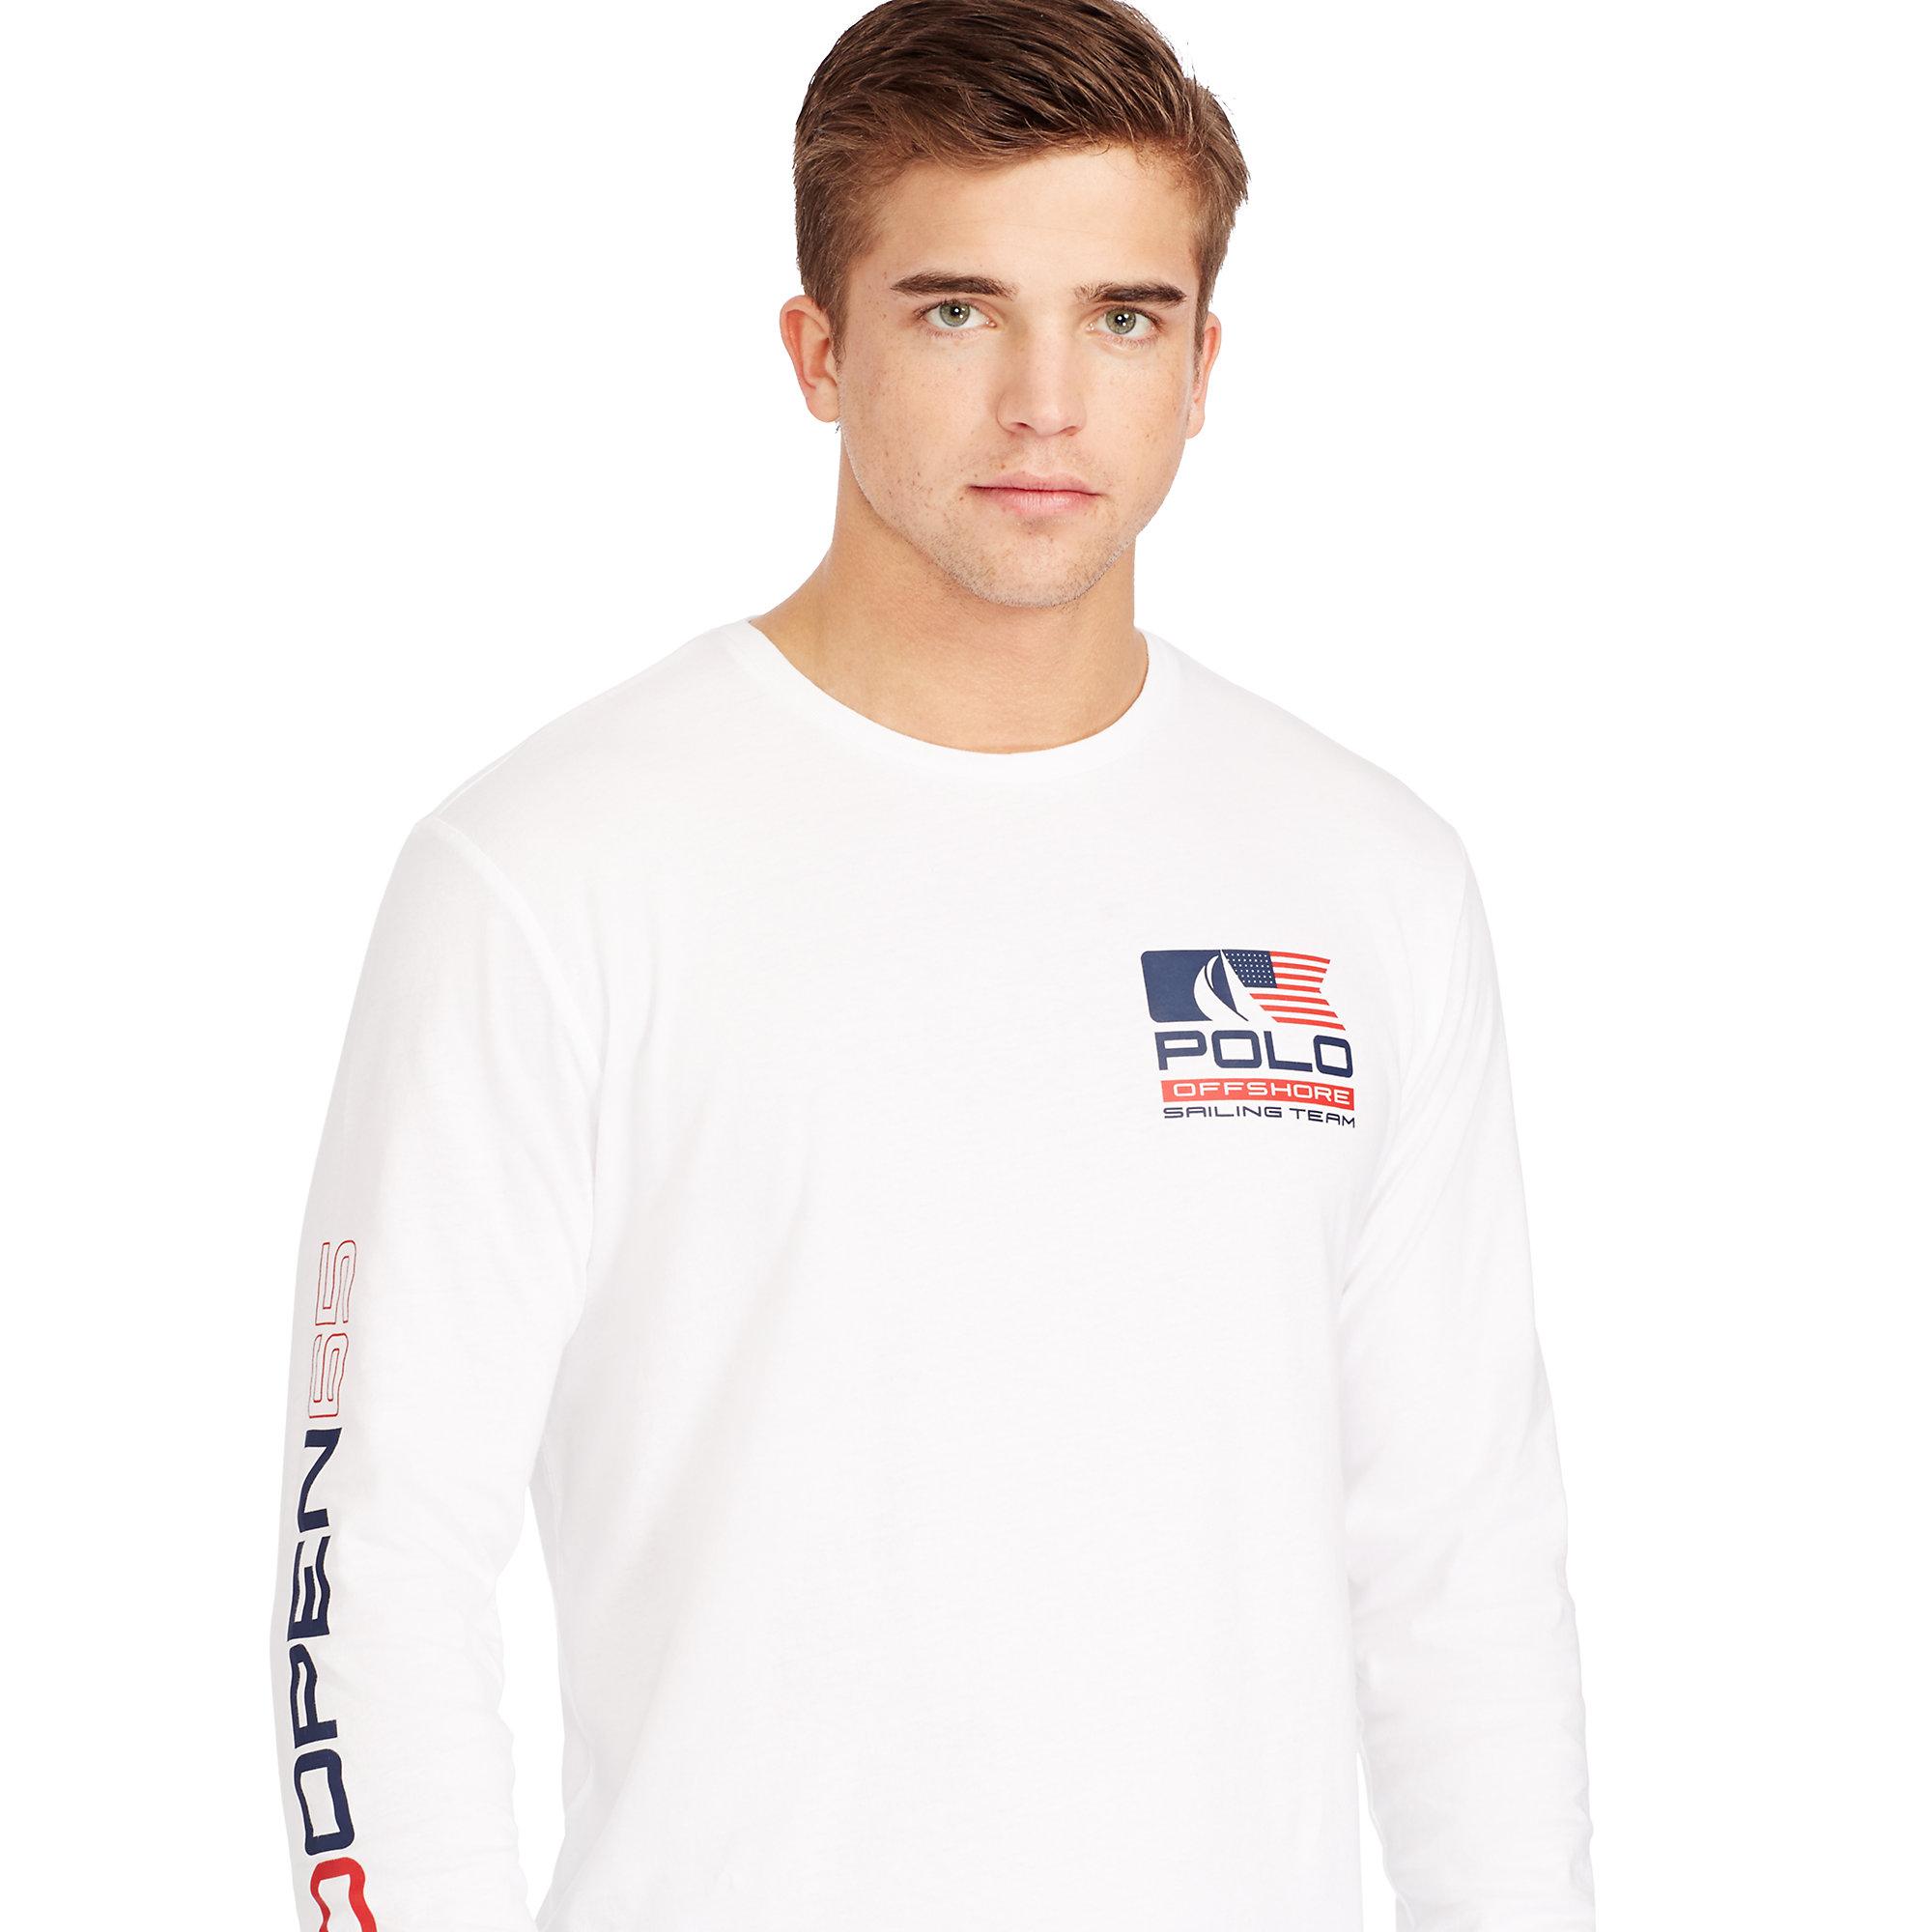 polo ralph lauren sailing team cotton t shirt in white. Black Bedroom Furniture Sets. Home Design Ideas